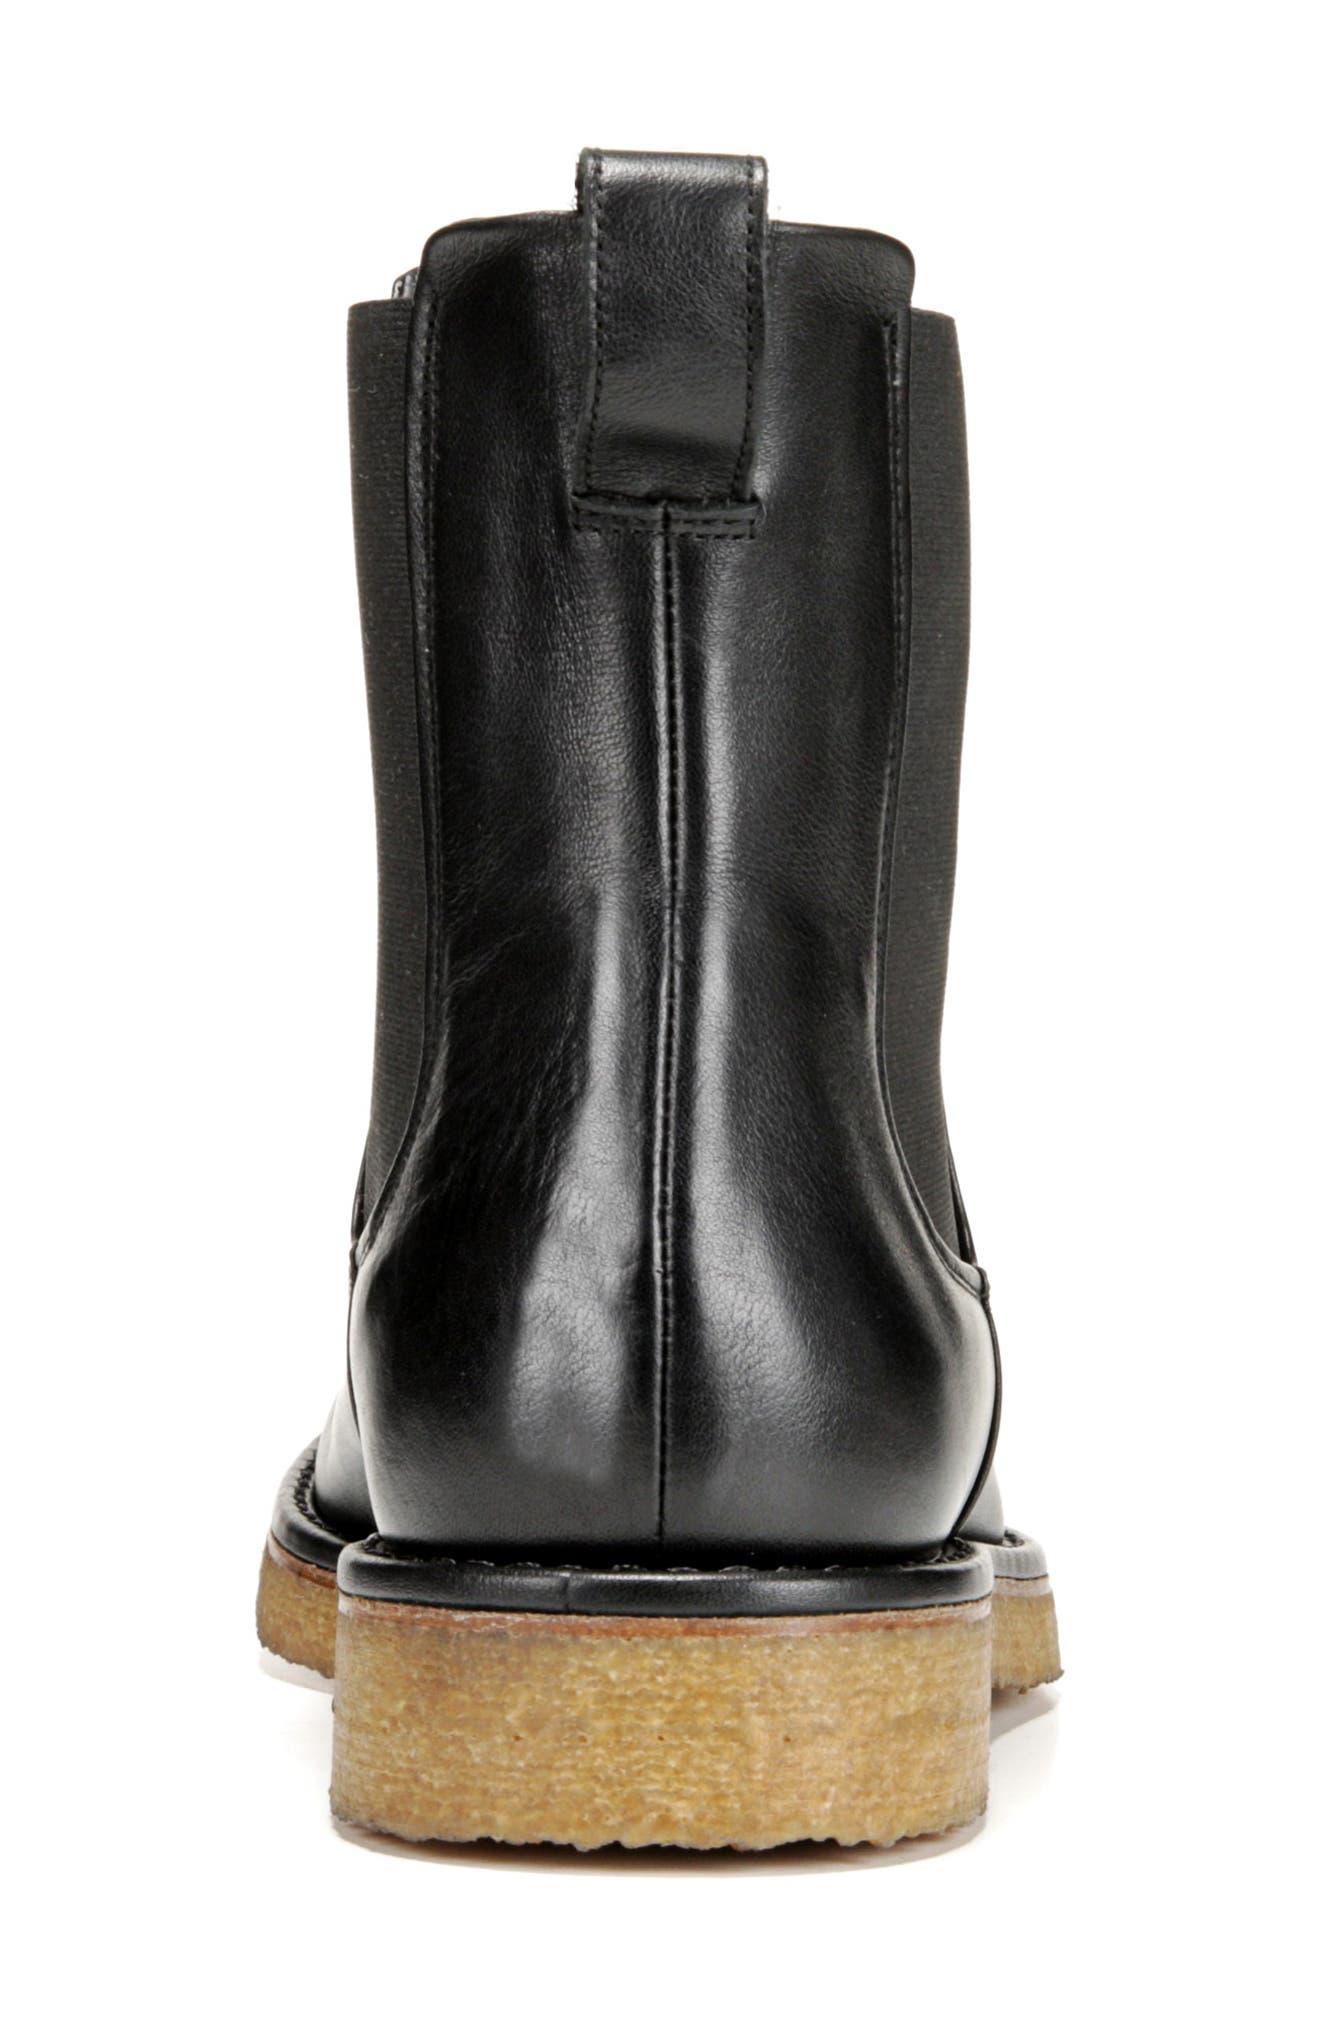 Cresslor Chelsea Boot,                             Alternate thumbnail 9, color,                             BLACK